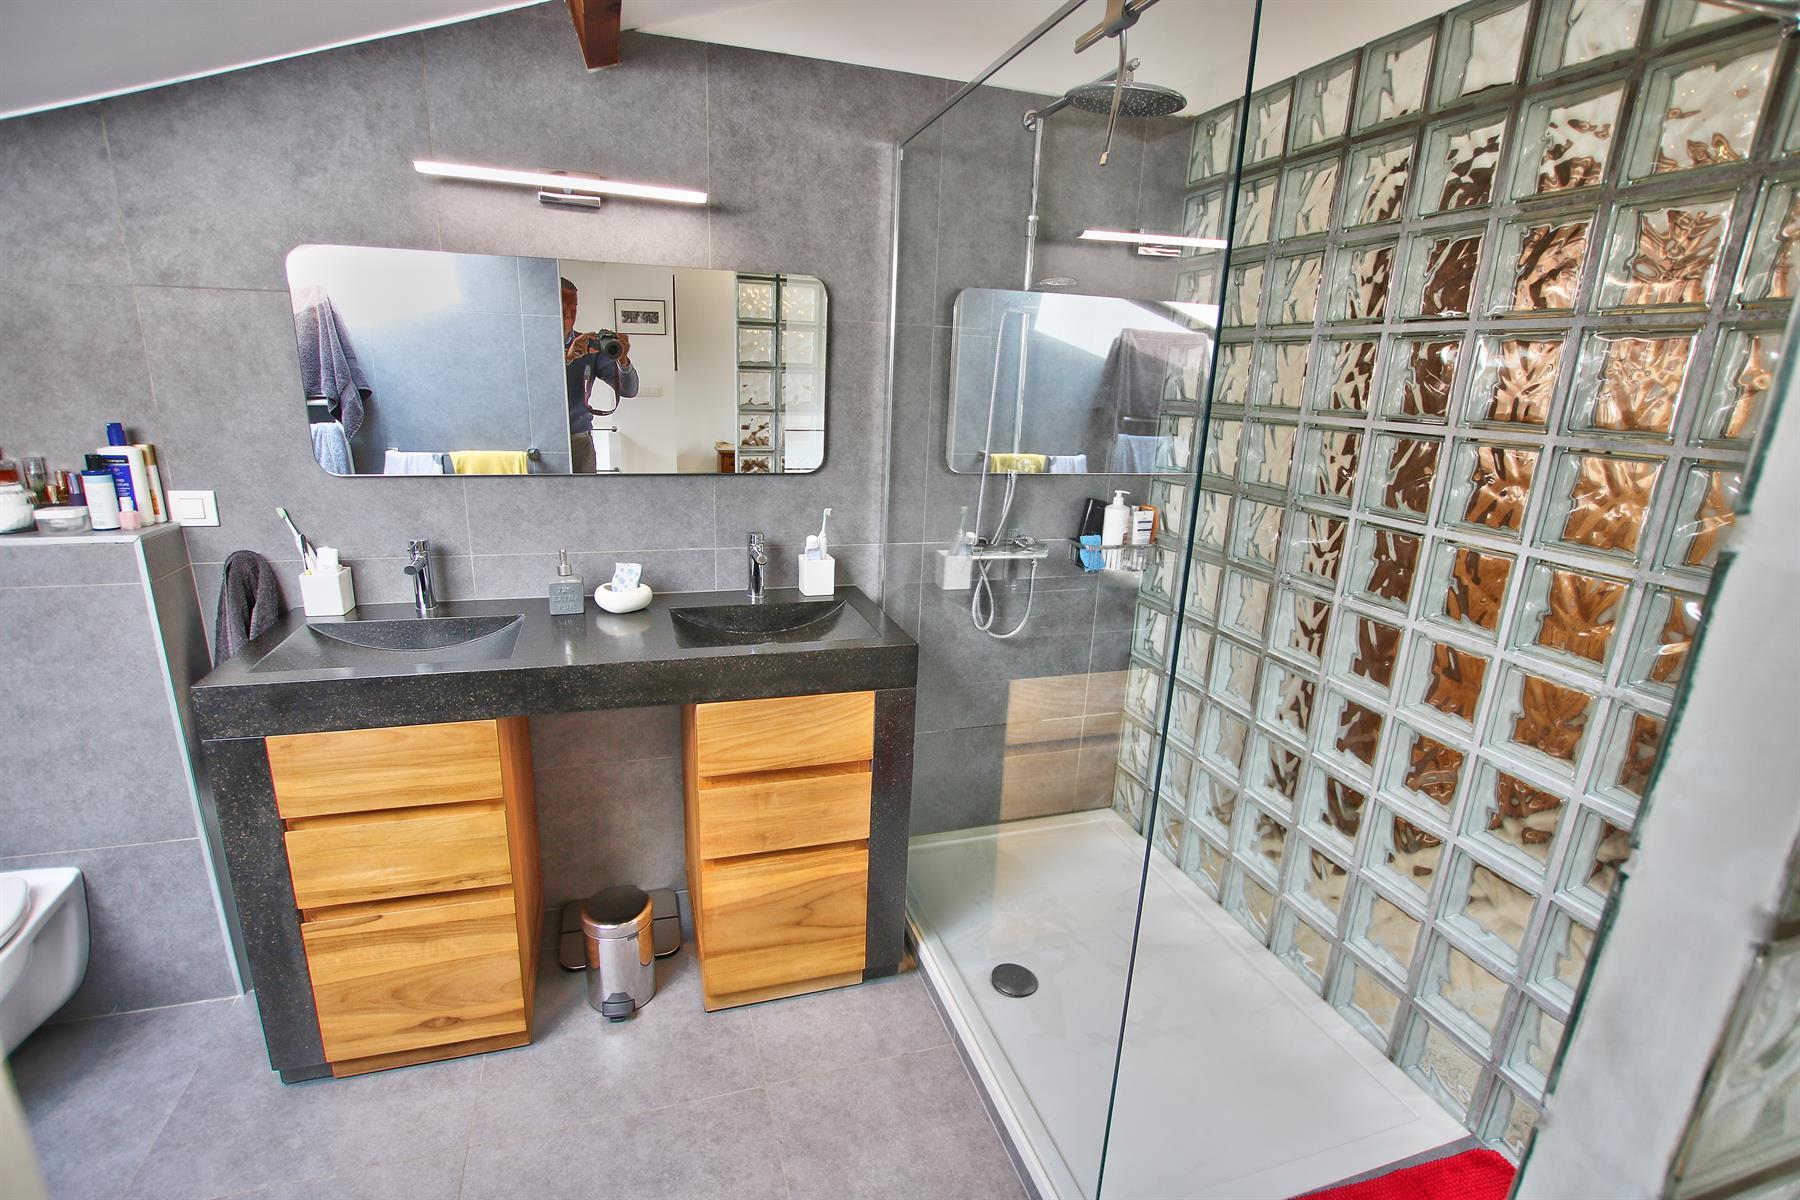 Maison - Etterbeek - #4454540-22